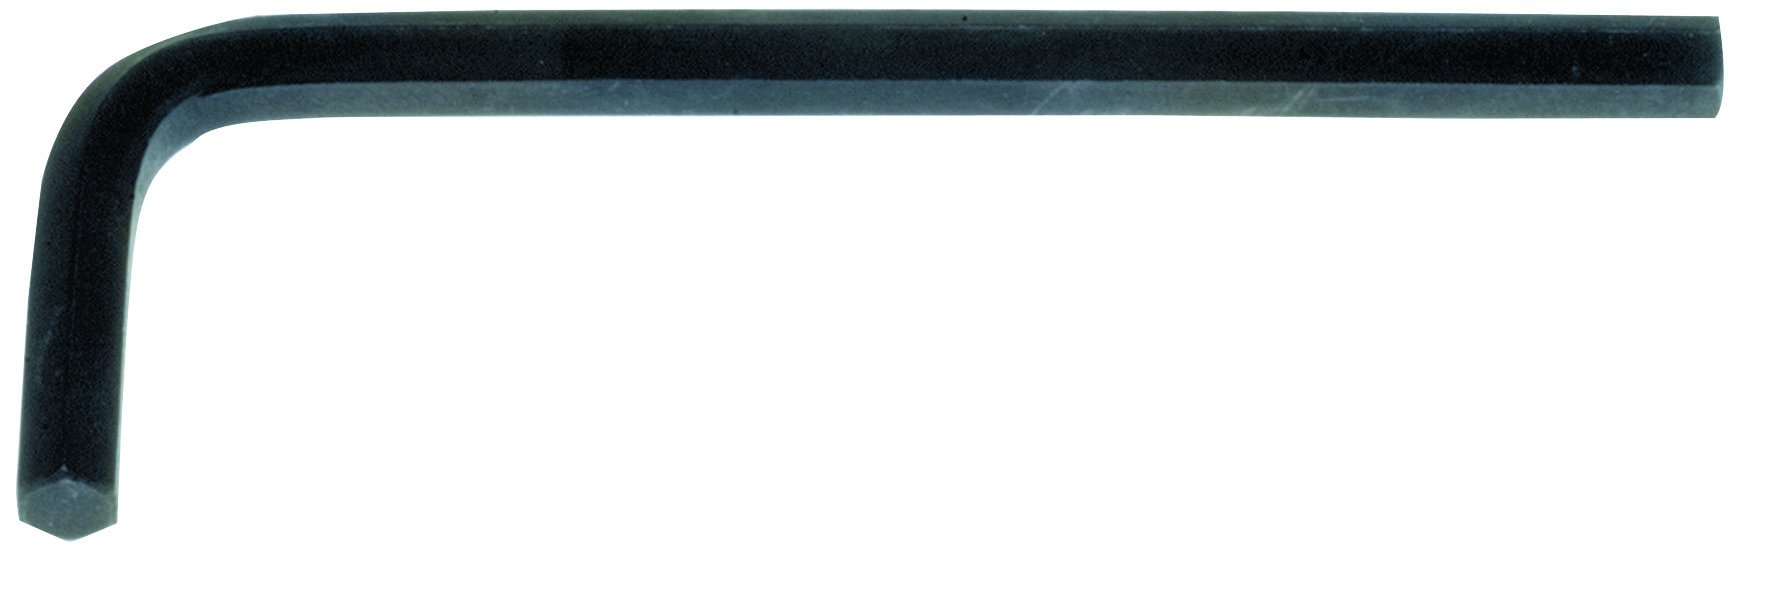 Urrea 49-3/8 3/8-Inch Short Arm L-Type Hex Key